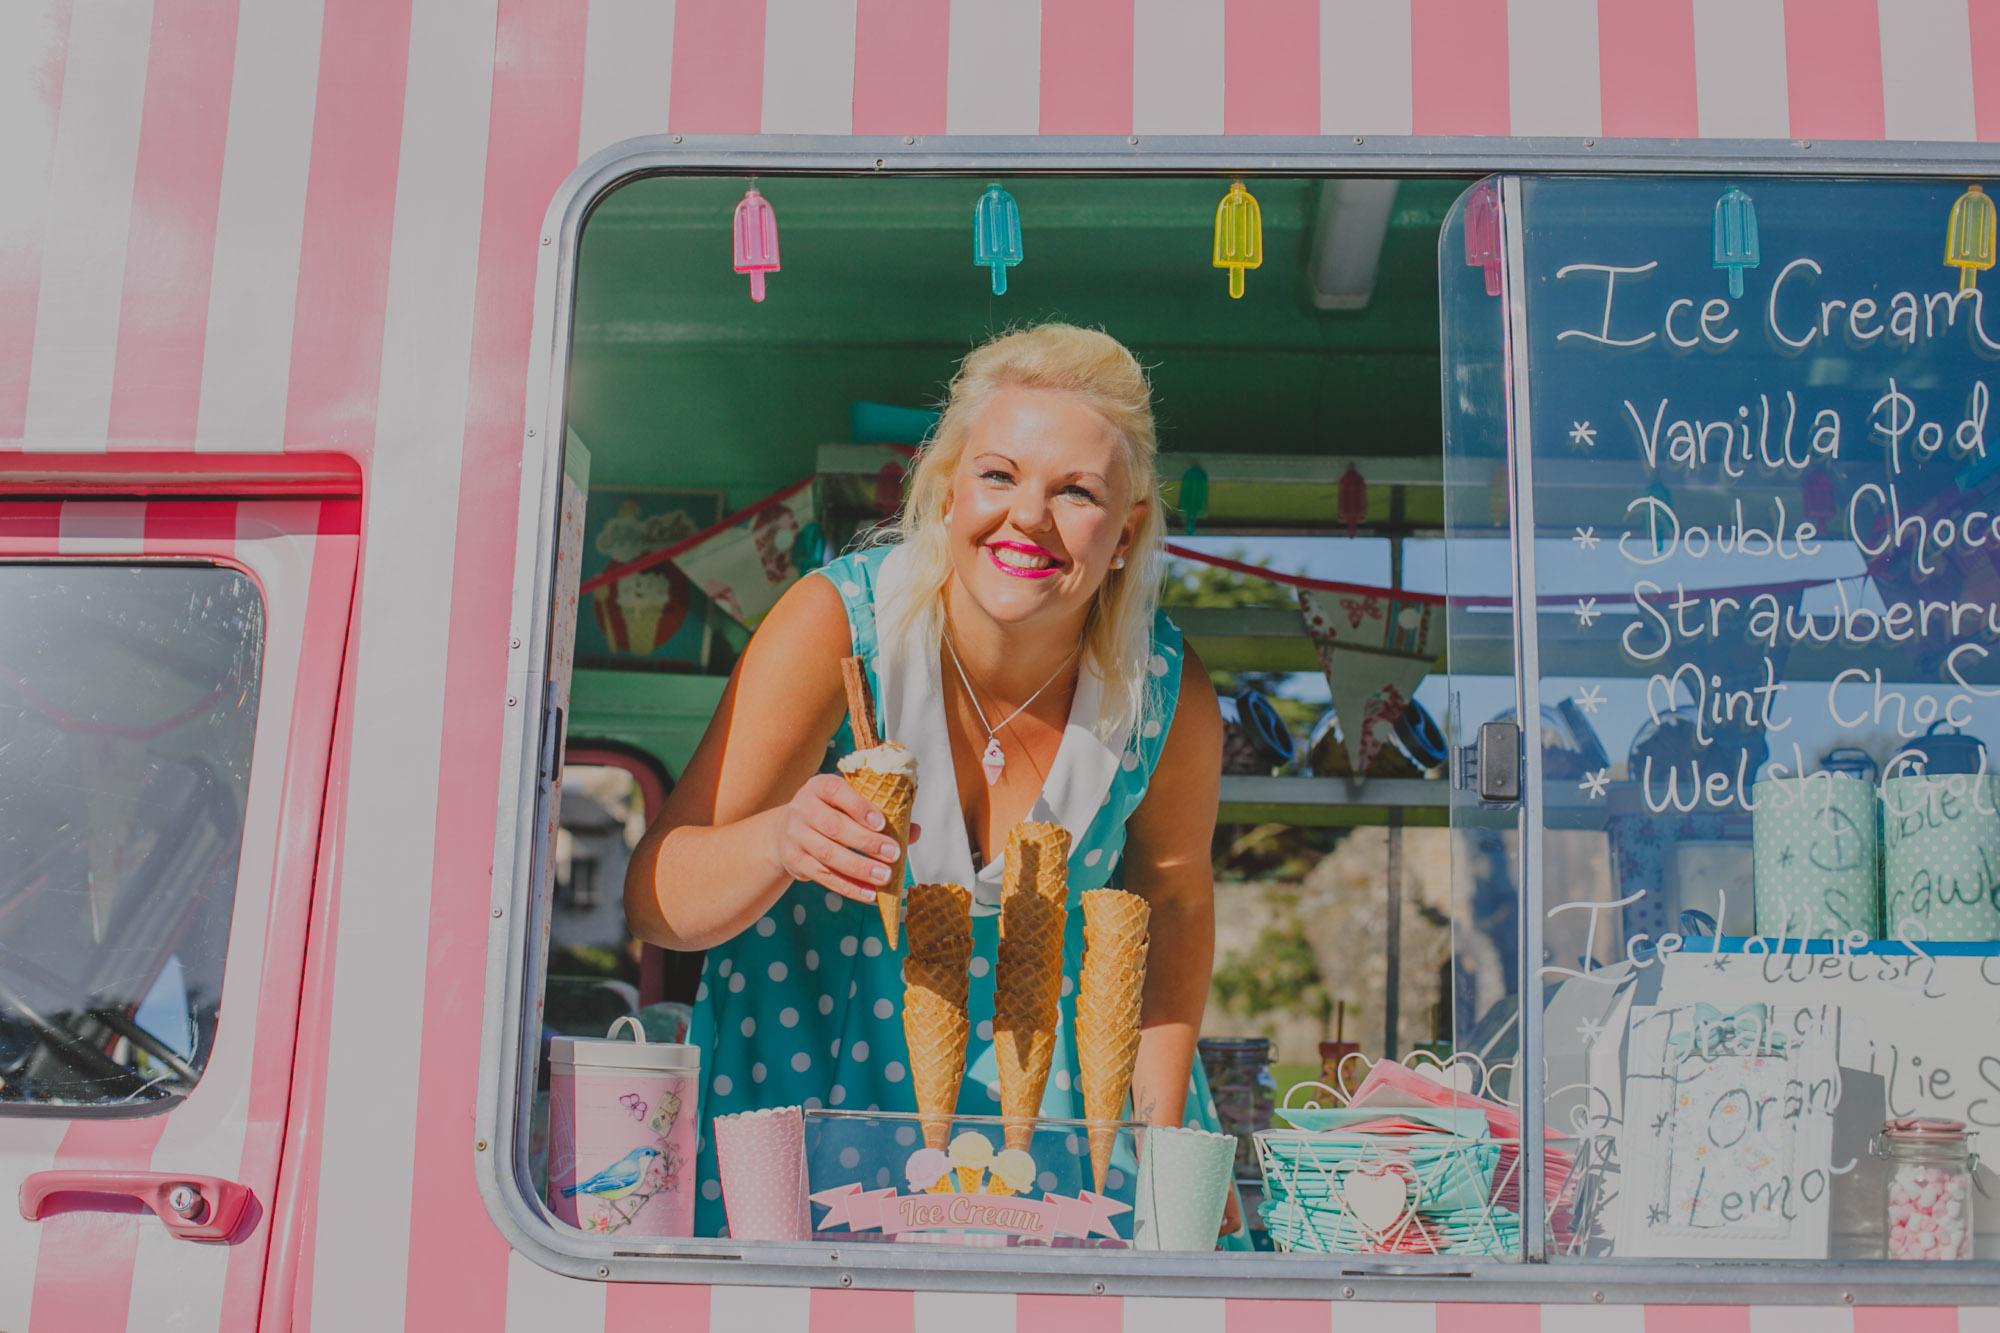 Vintage_ice_cream_South_Wales-5.jpg